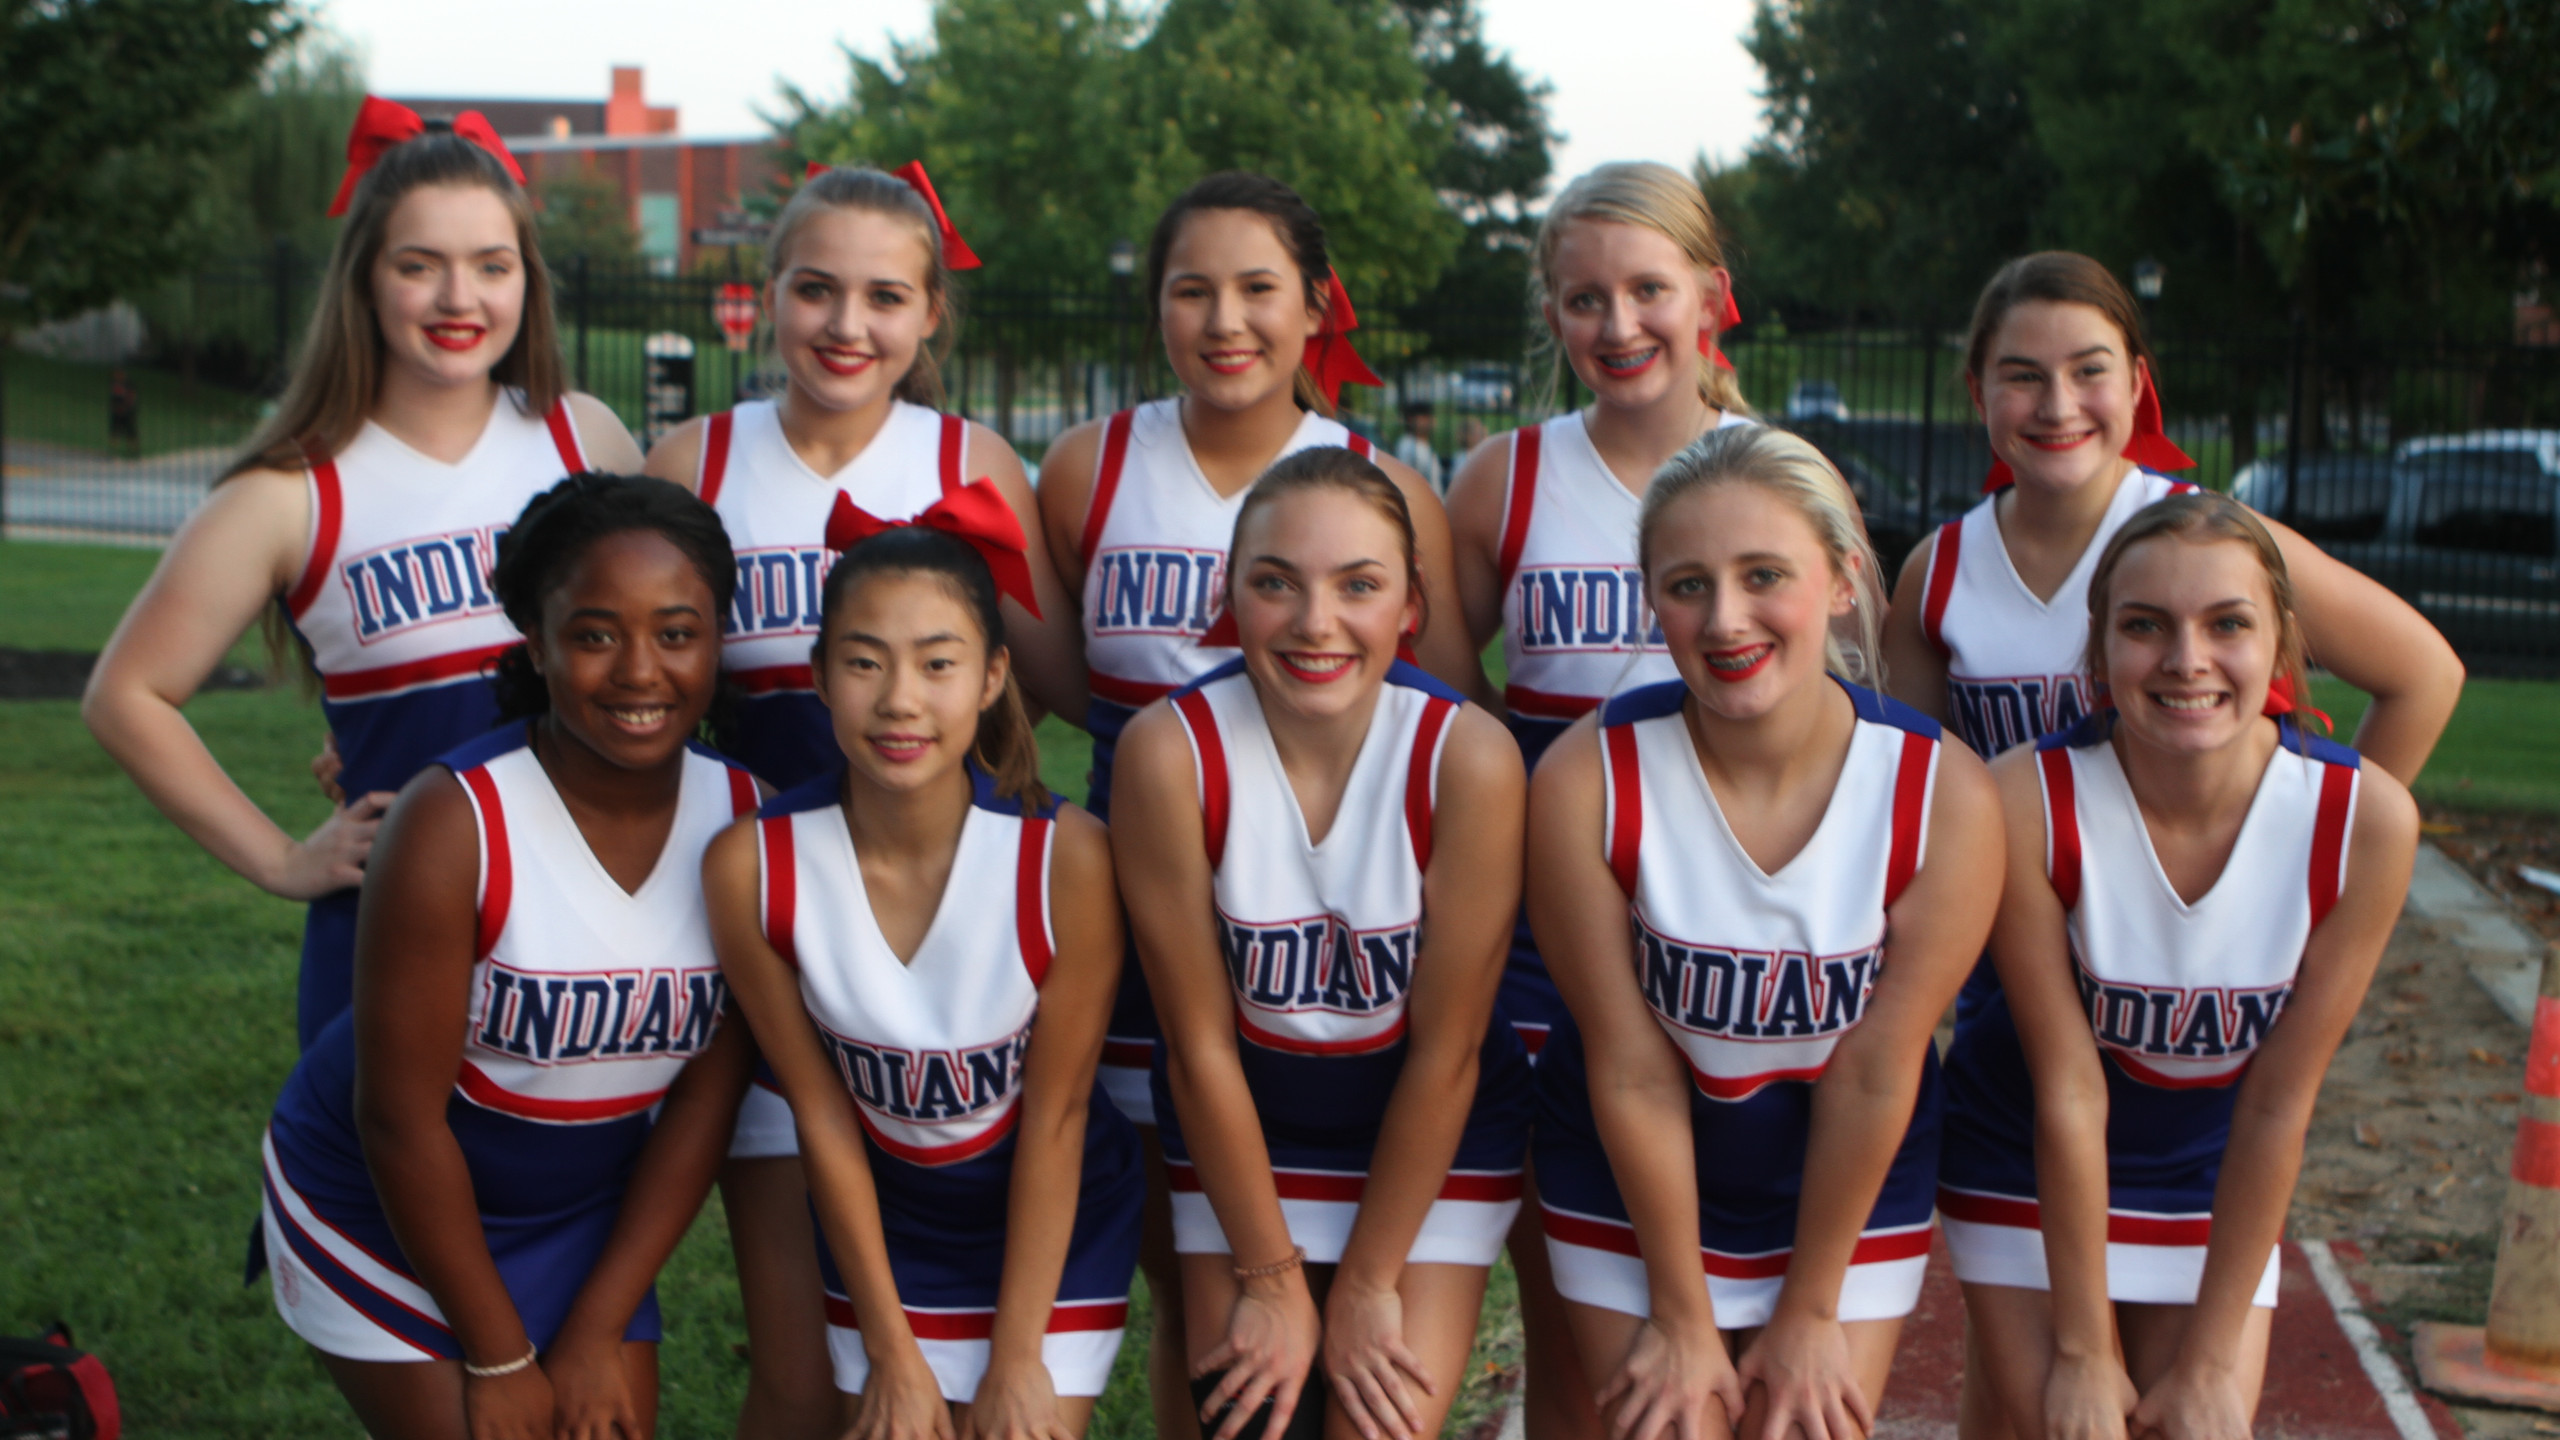 Montgomery Central Indians Cheerleaders